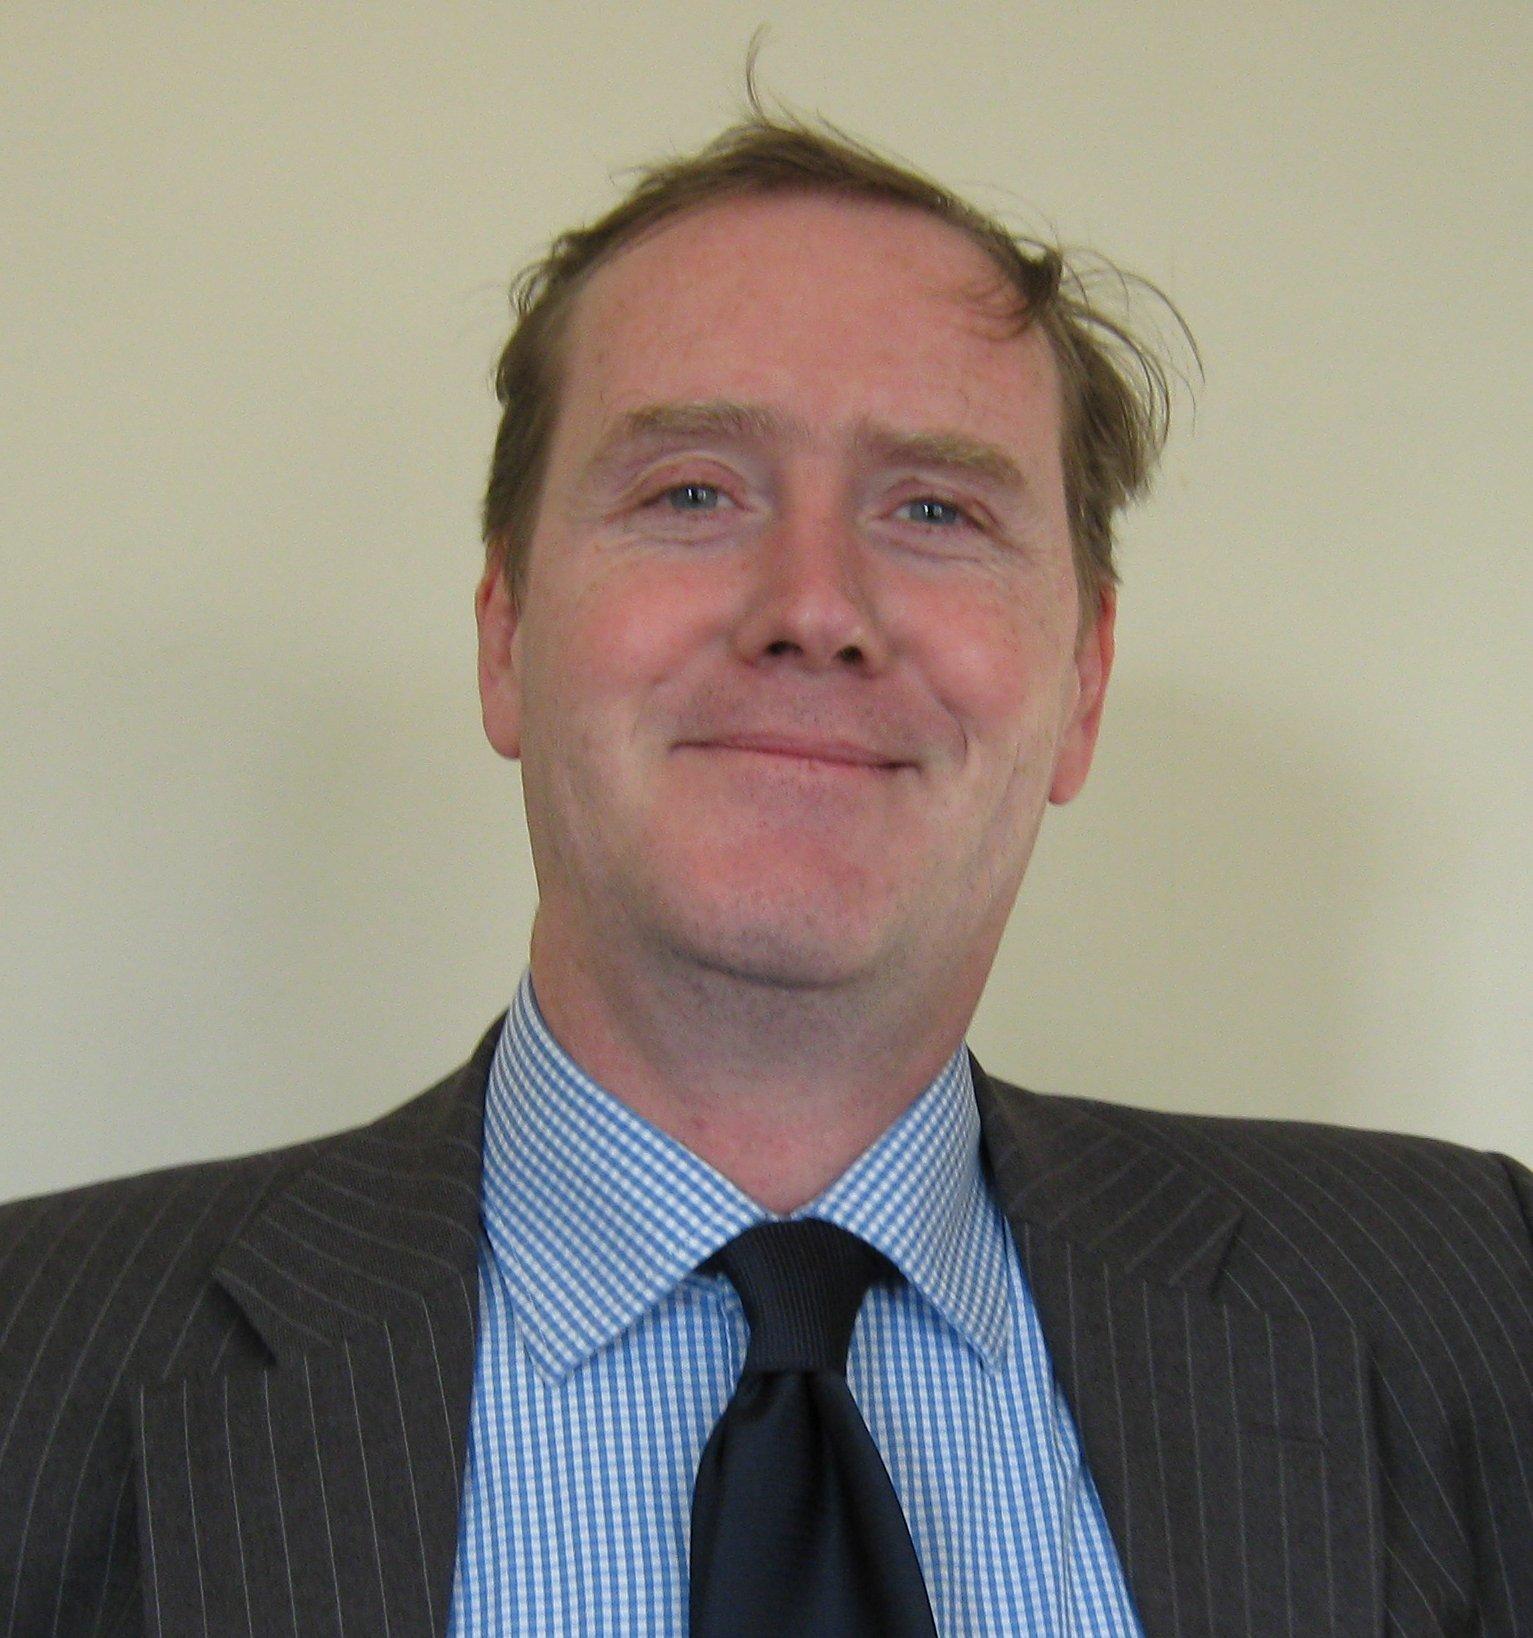 Roseland Parc Village Manager - Simon Baird